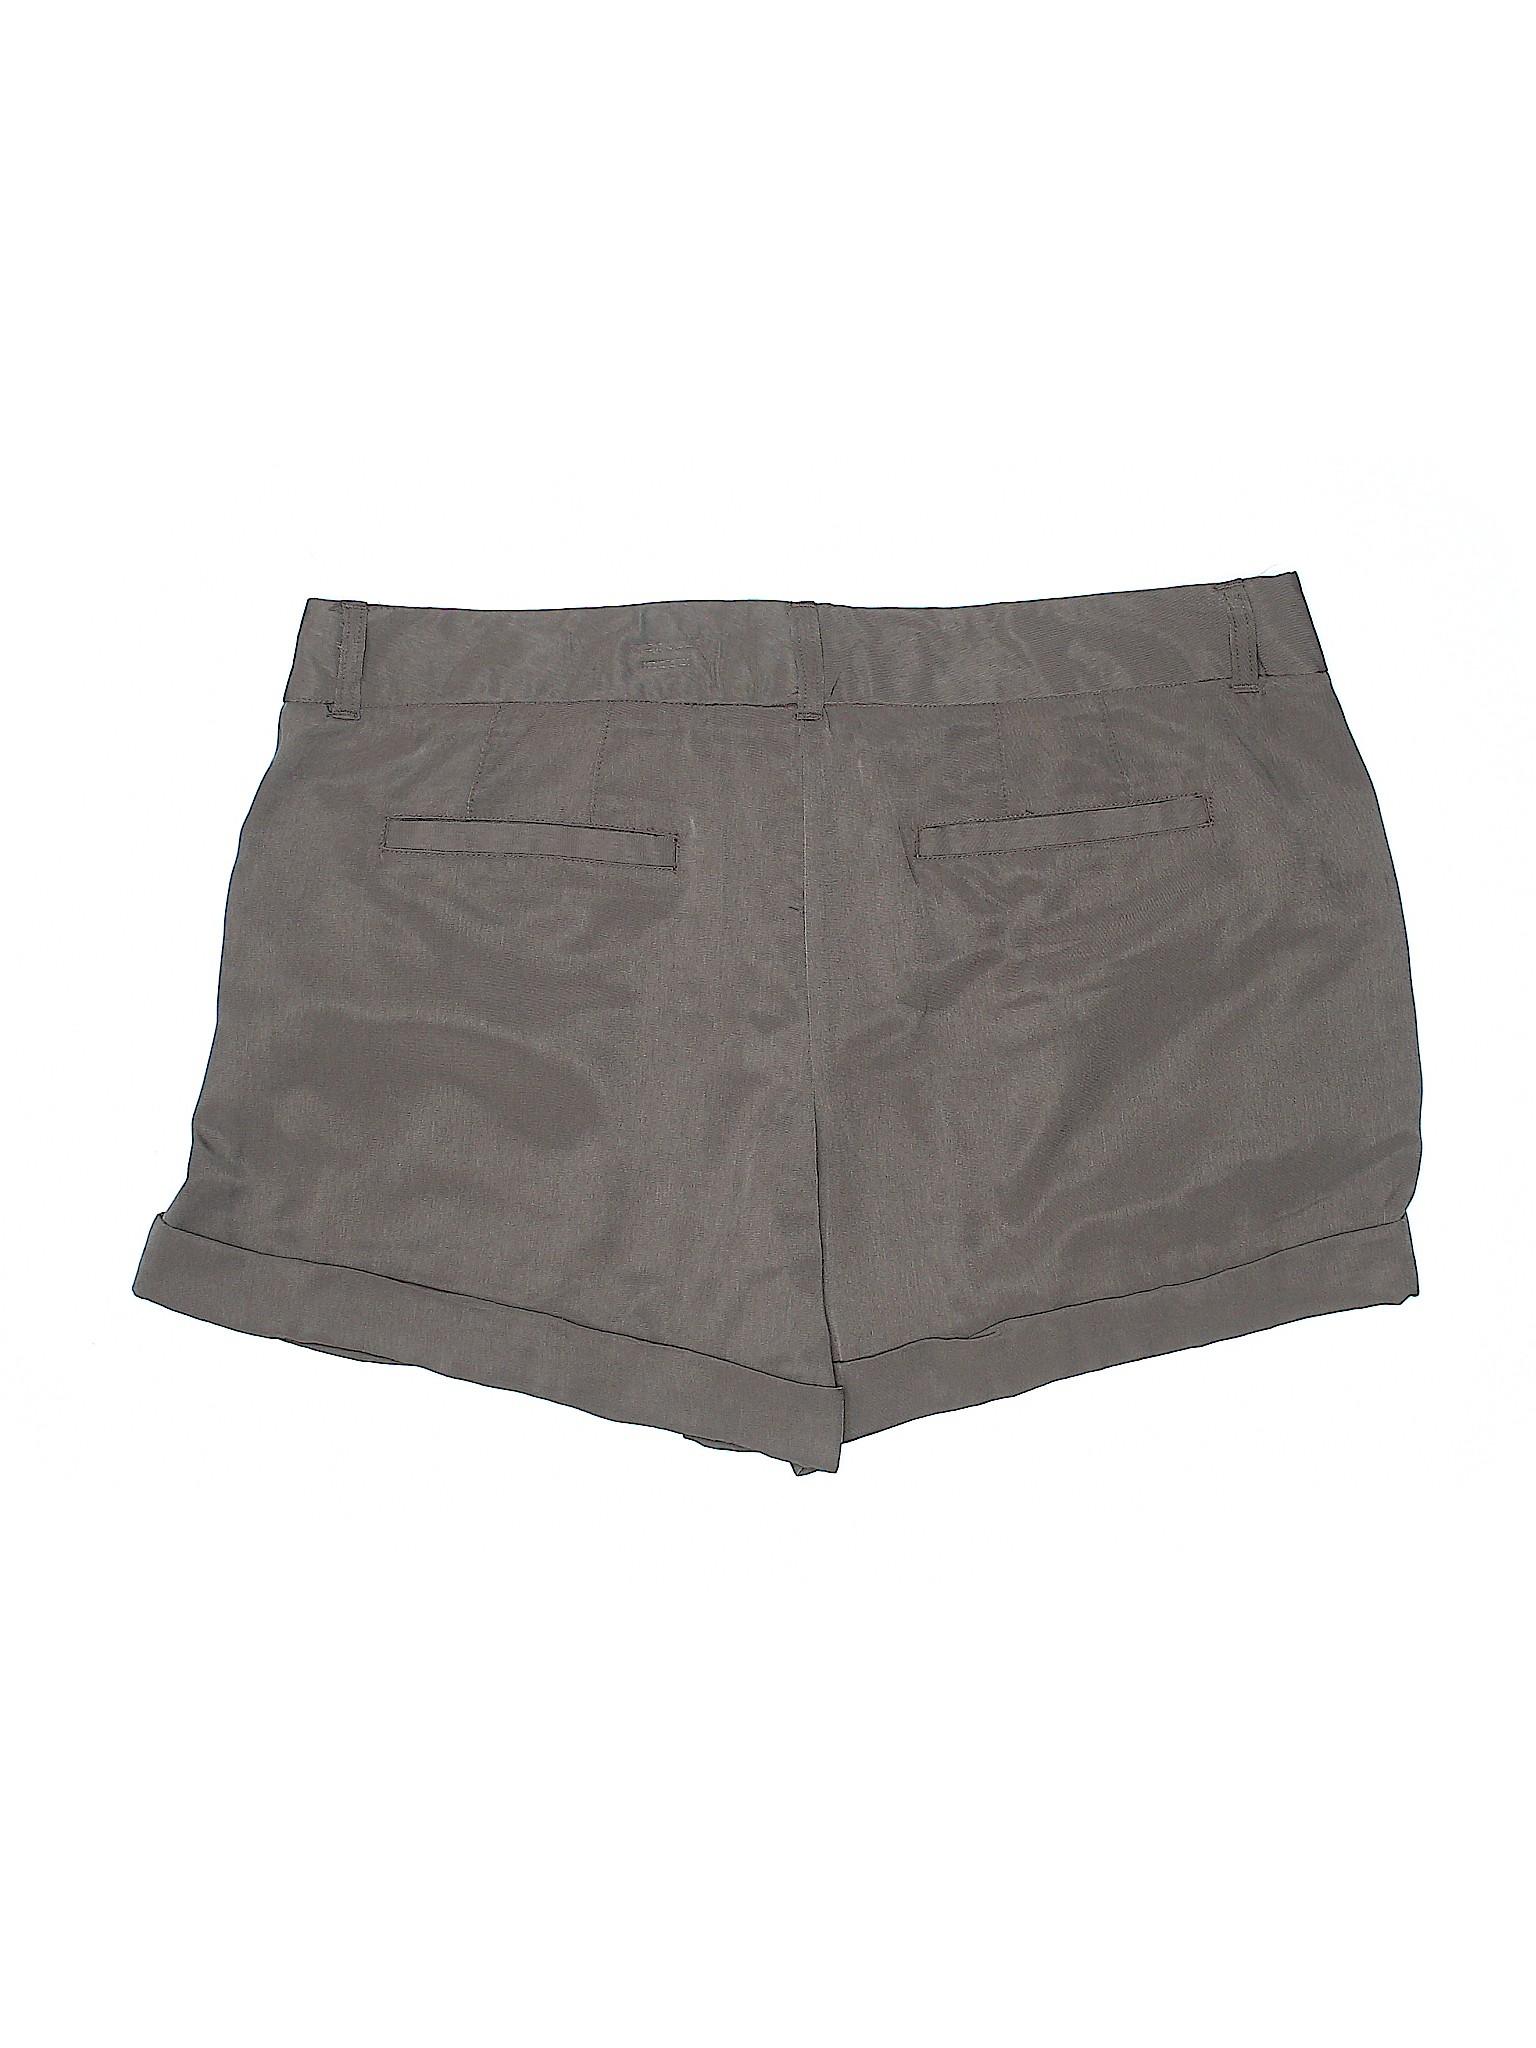 Boutique Boutique Old Shorts Navy Old Boutique Navy Dressy Shorts Dressy rvXZtzrq